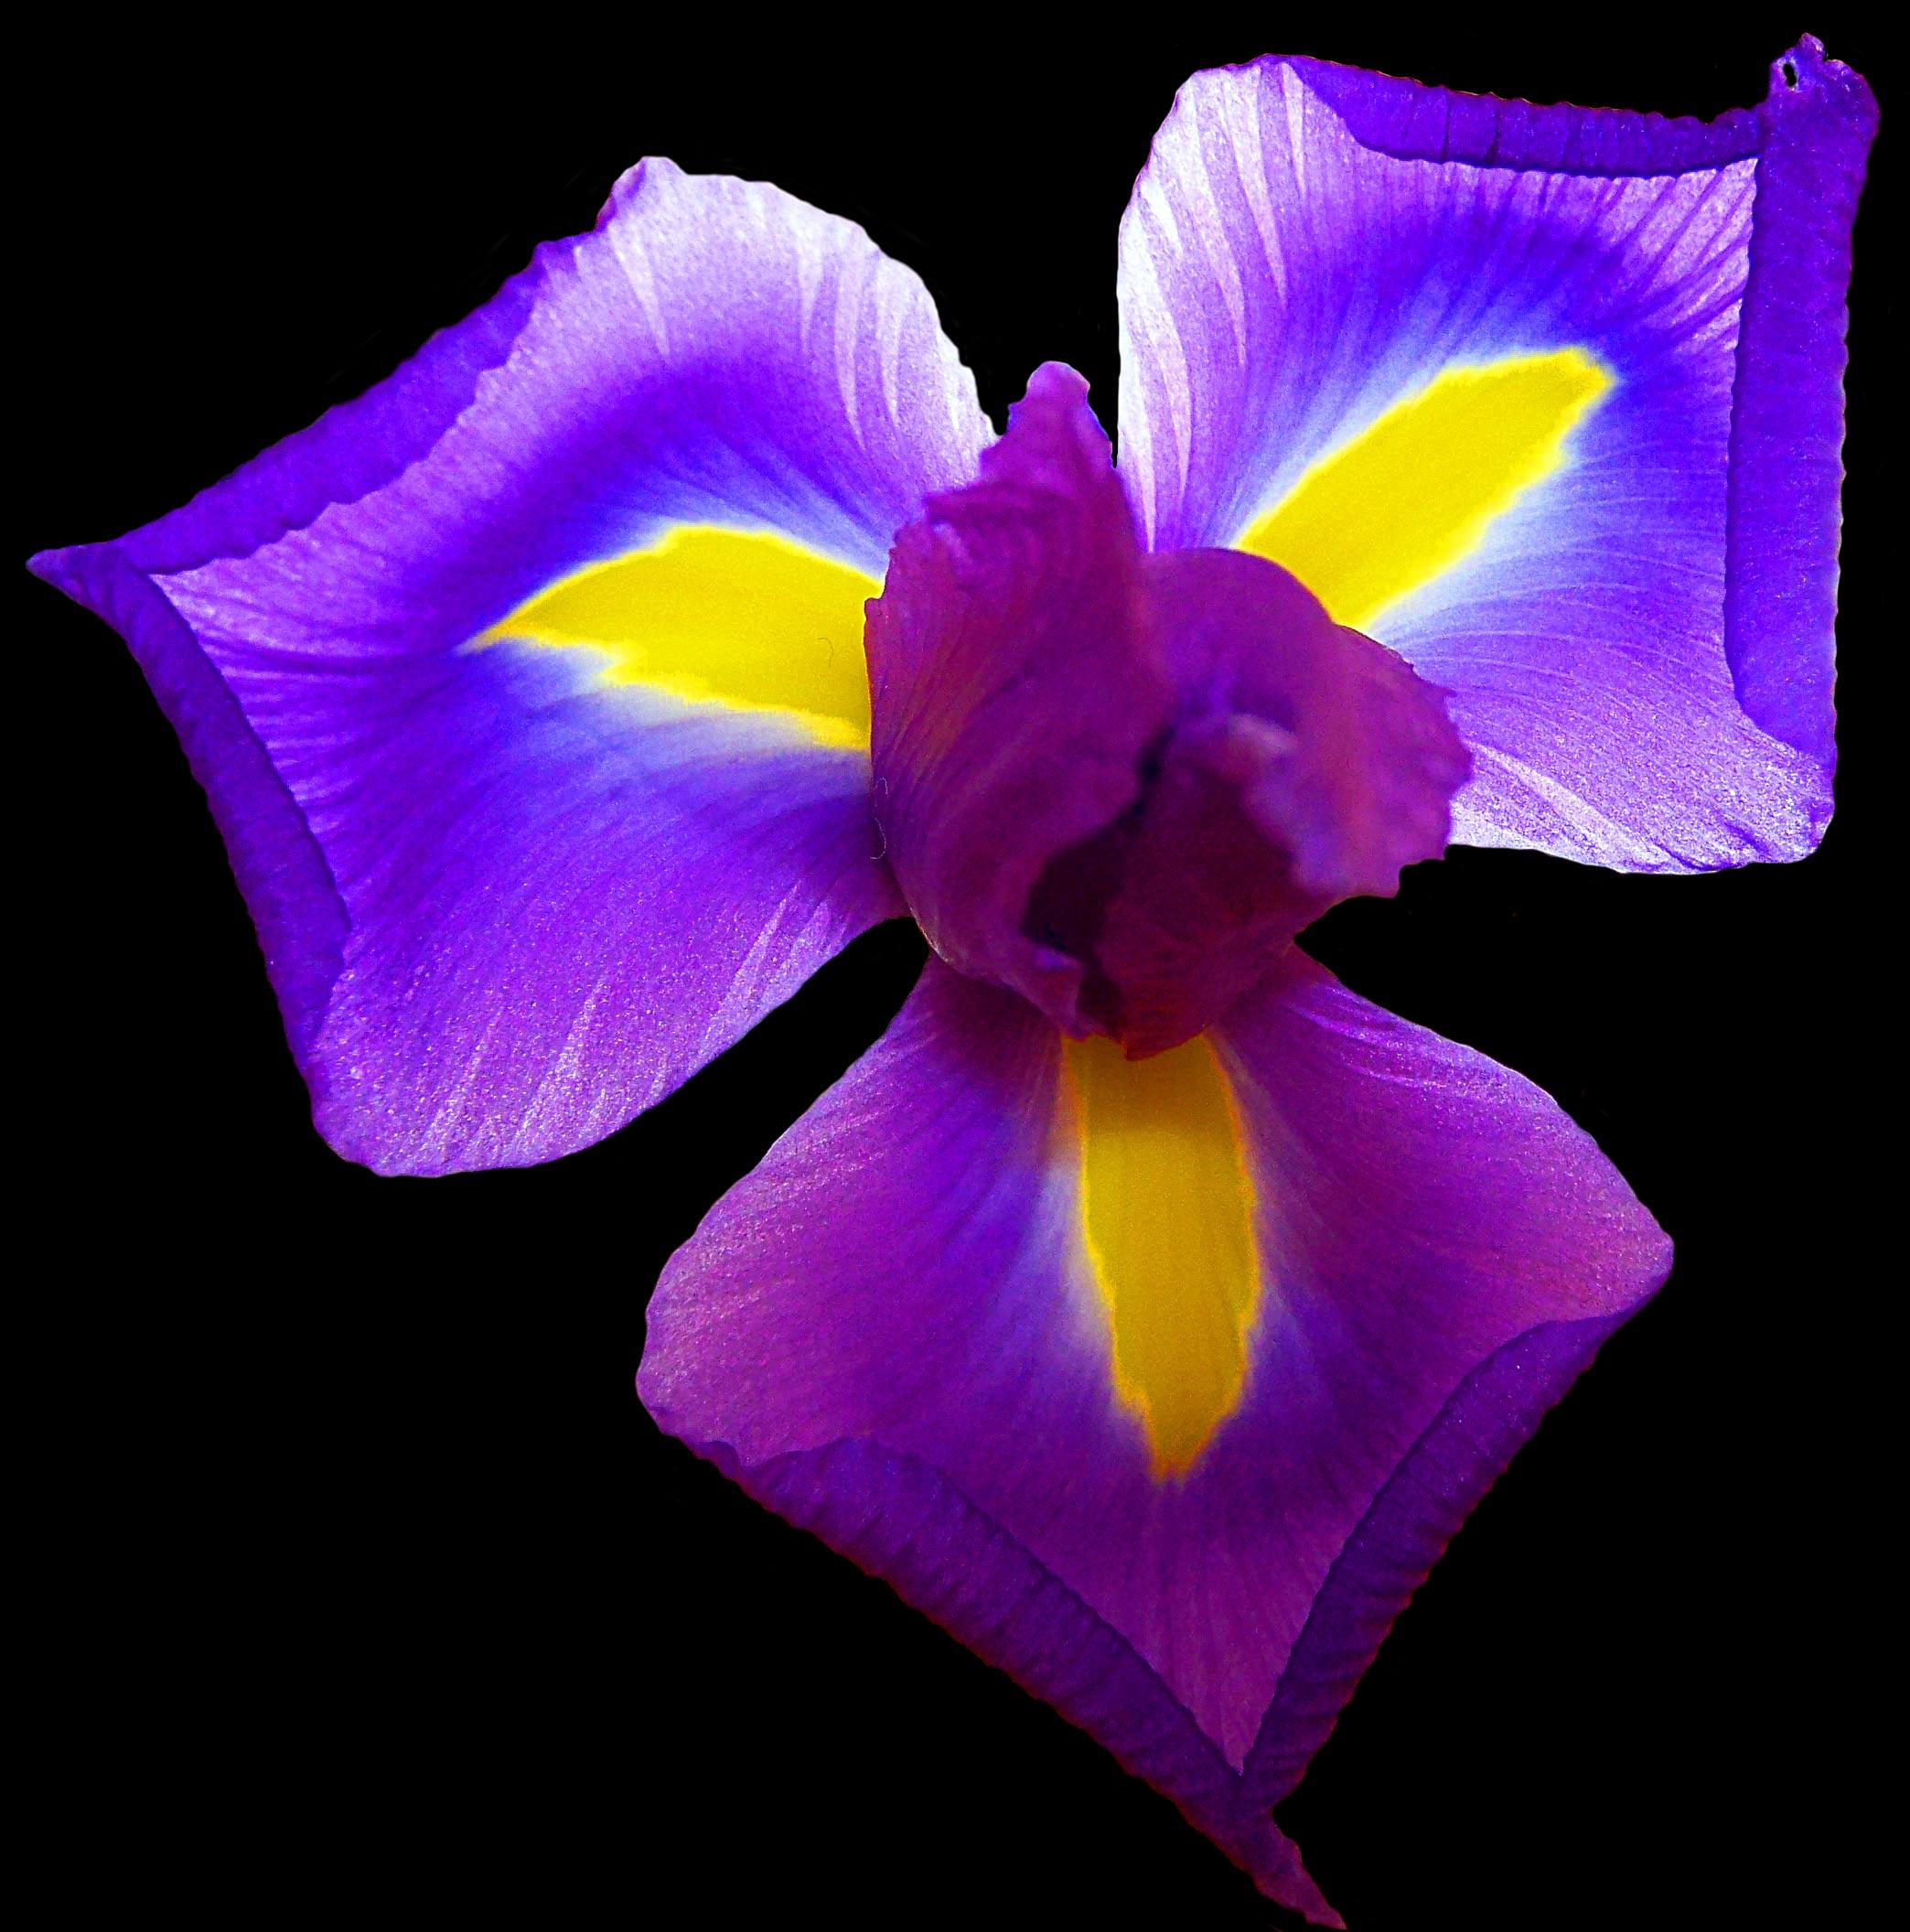 iris flower care archives flower press